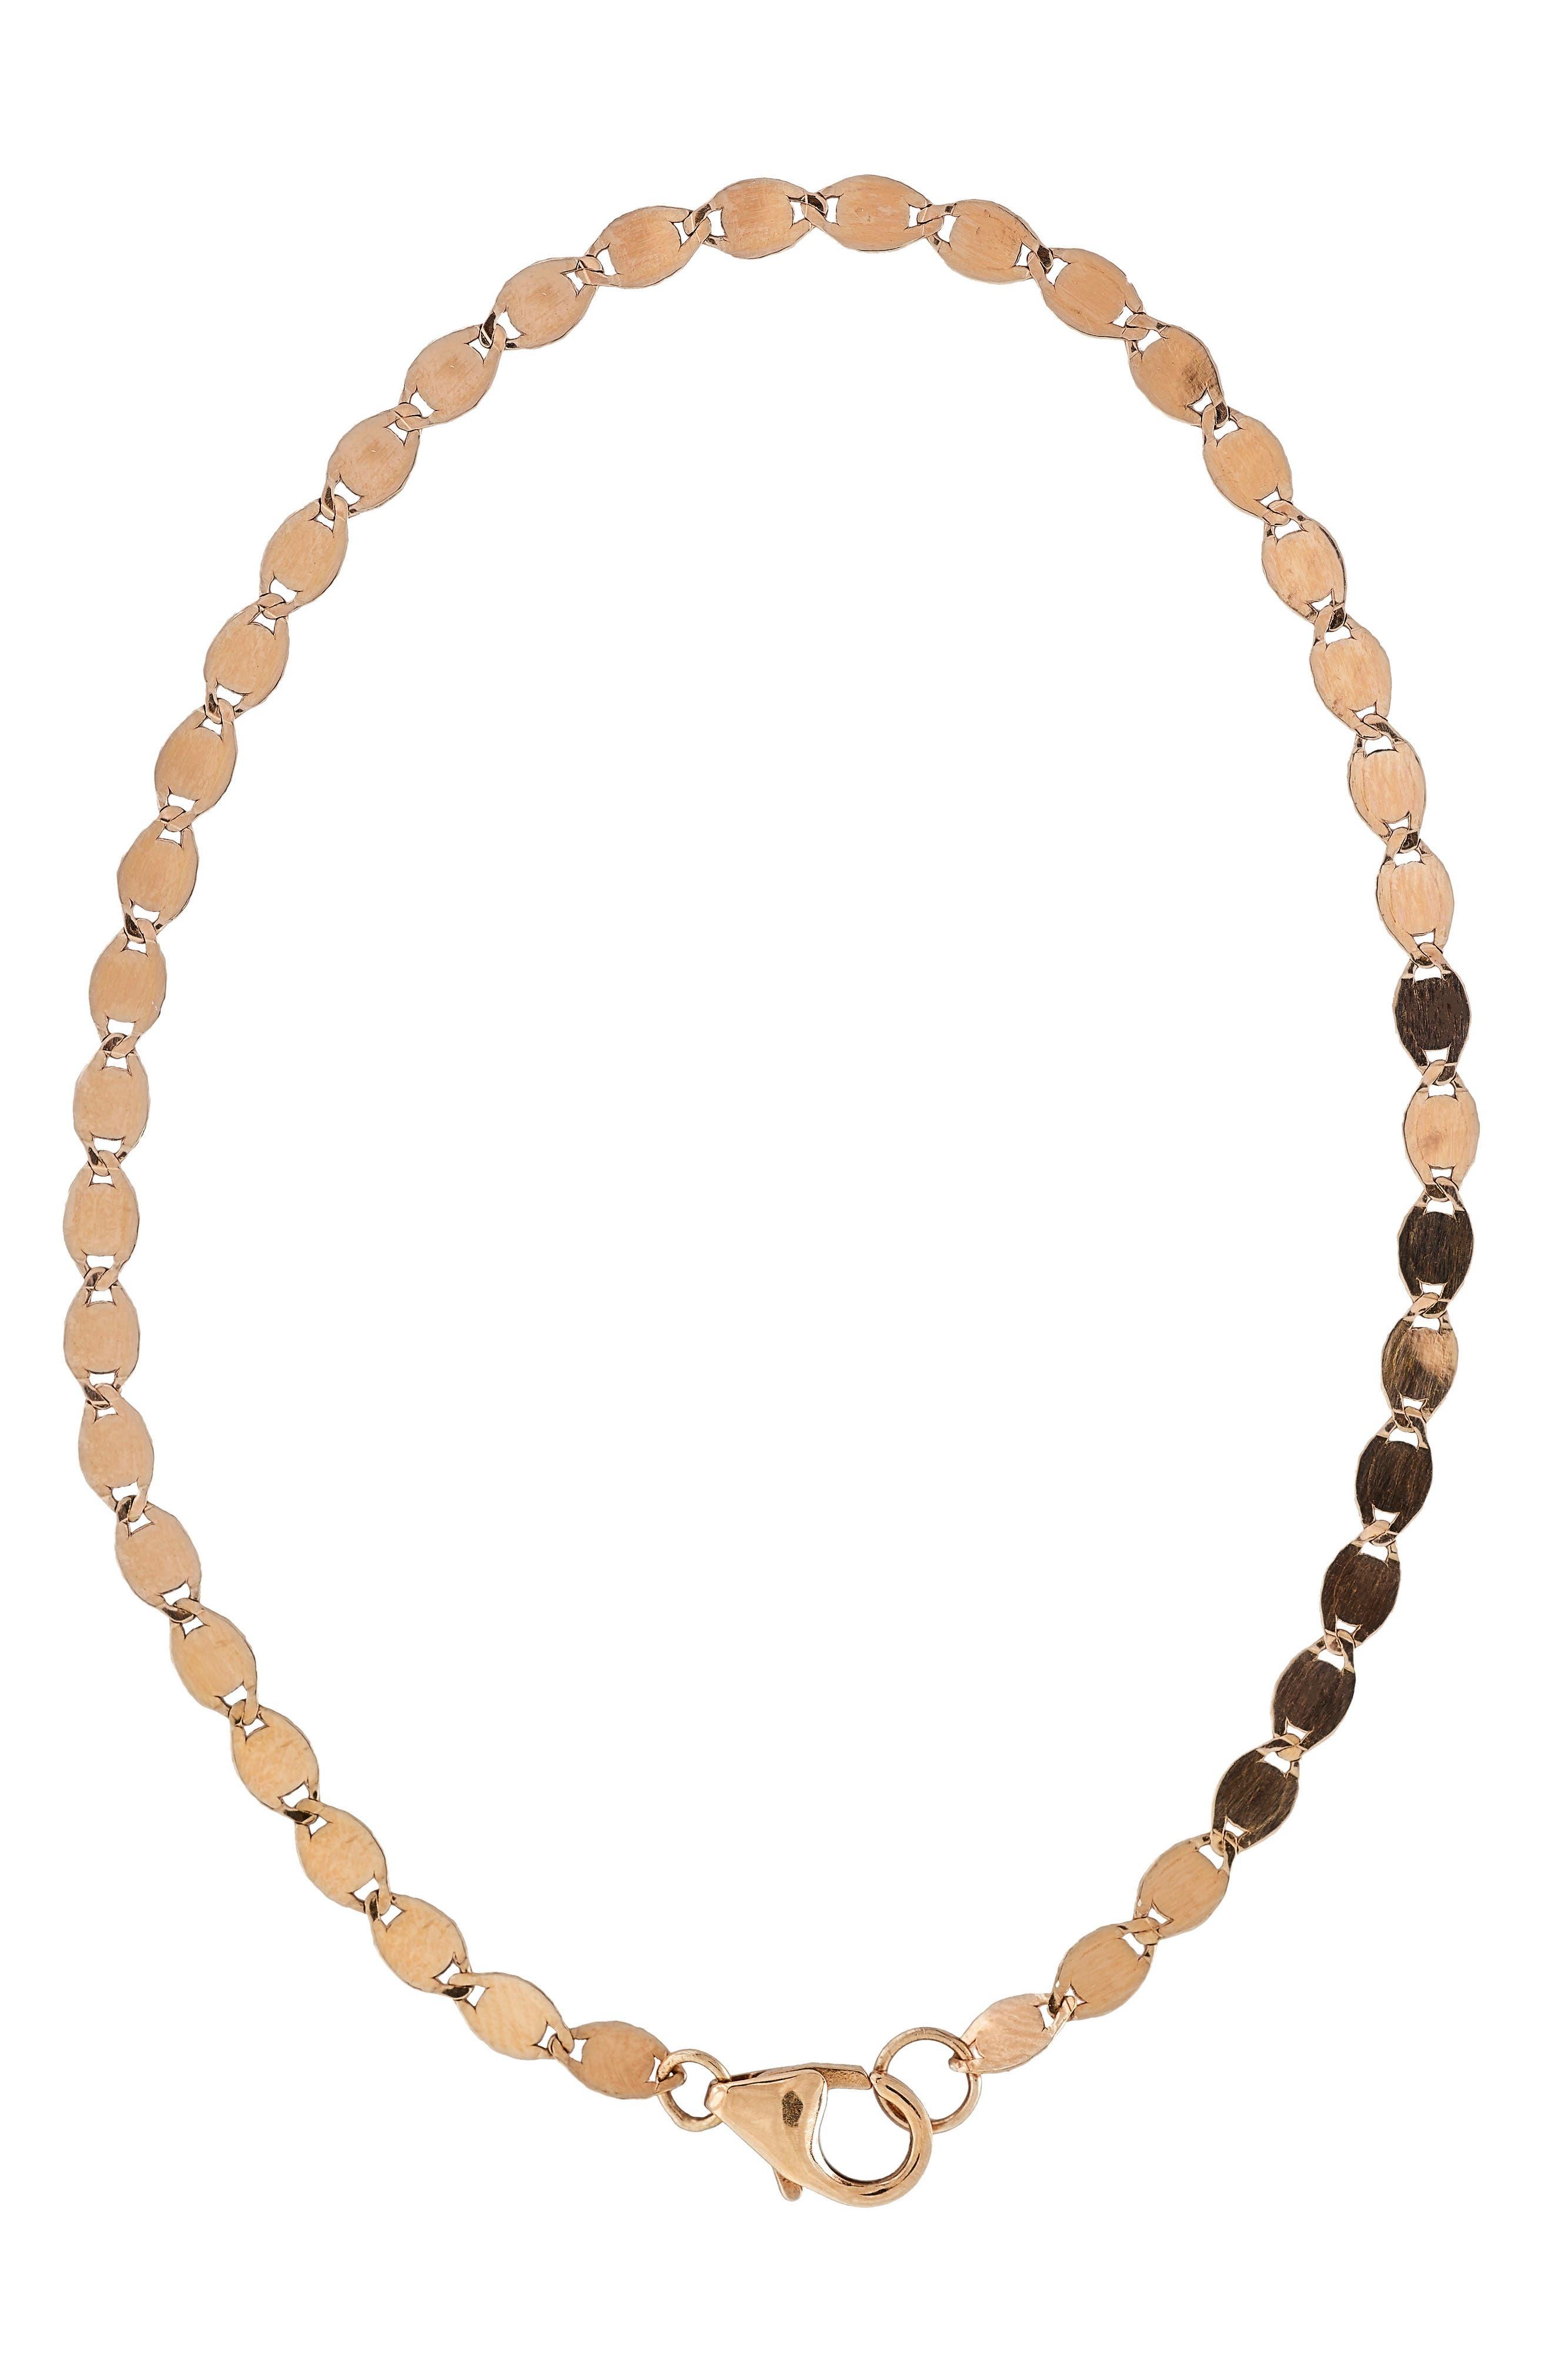 Alternate Image 1 Selected - Lana Jewelry Nude Link Bracelet